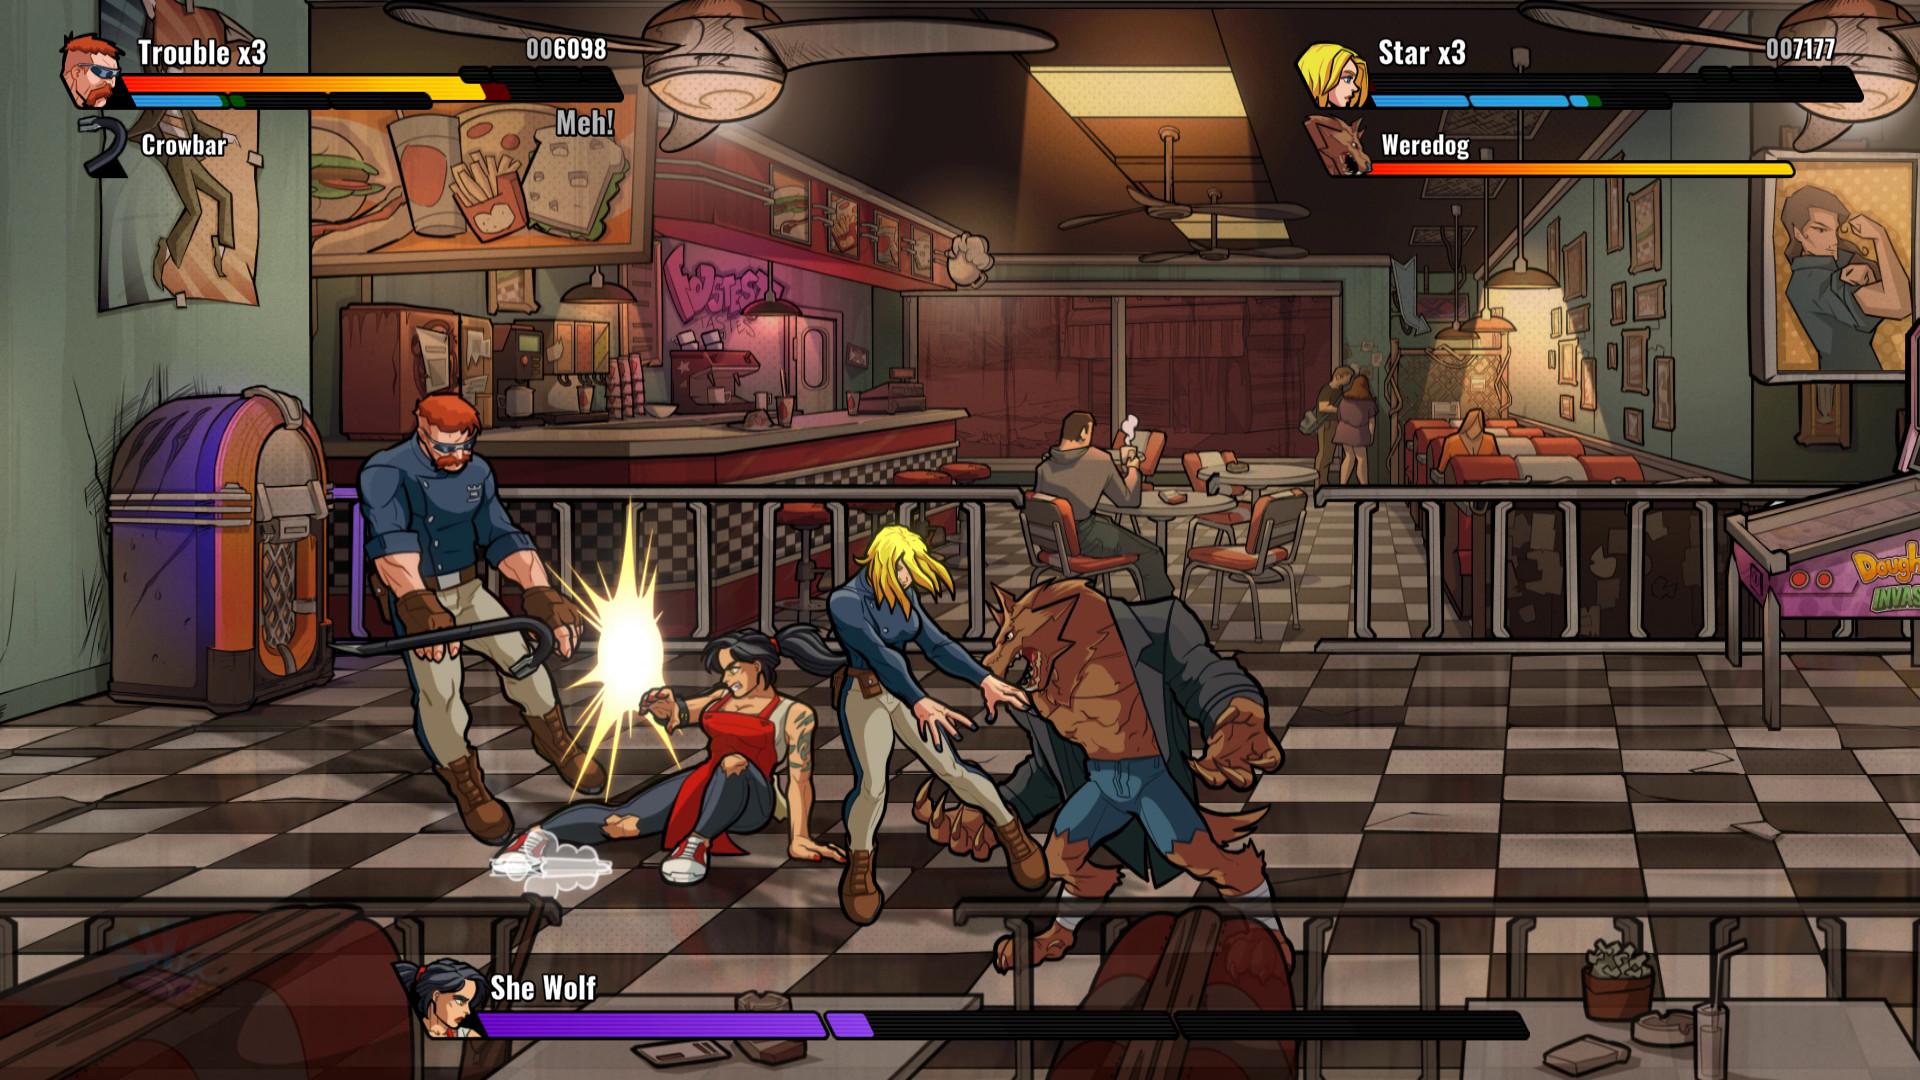 mayhem-brawler-pc-screenshot-2